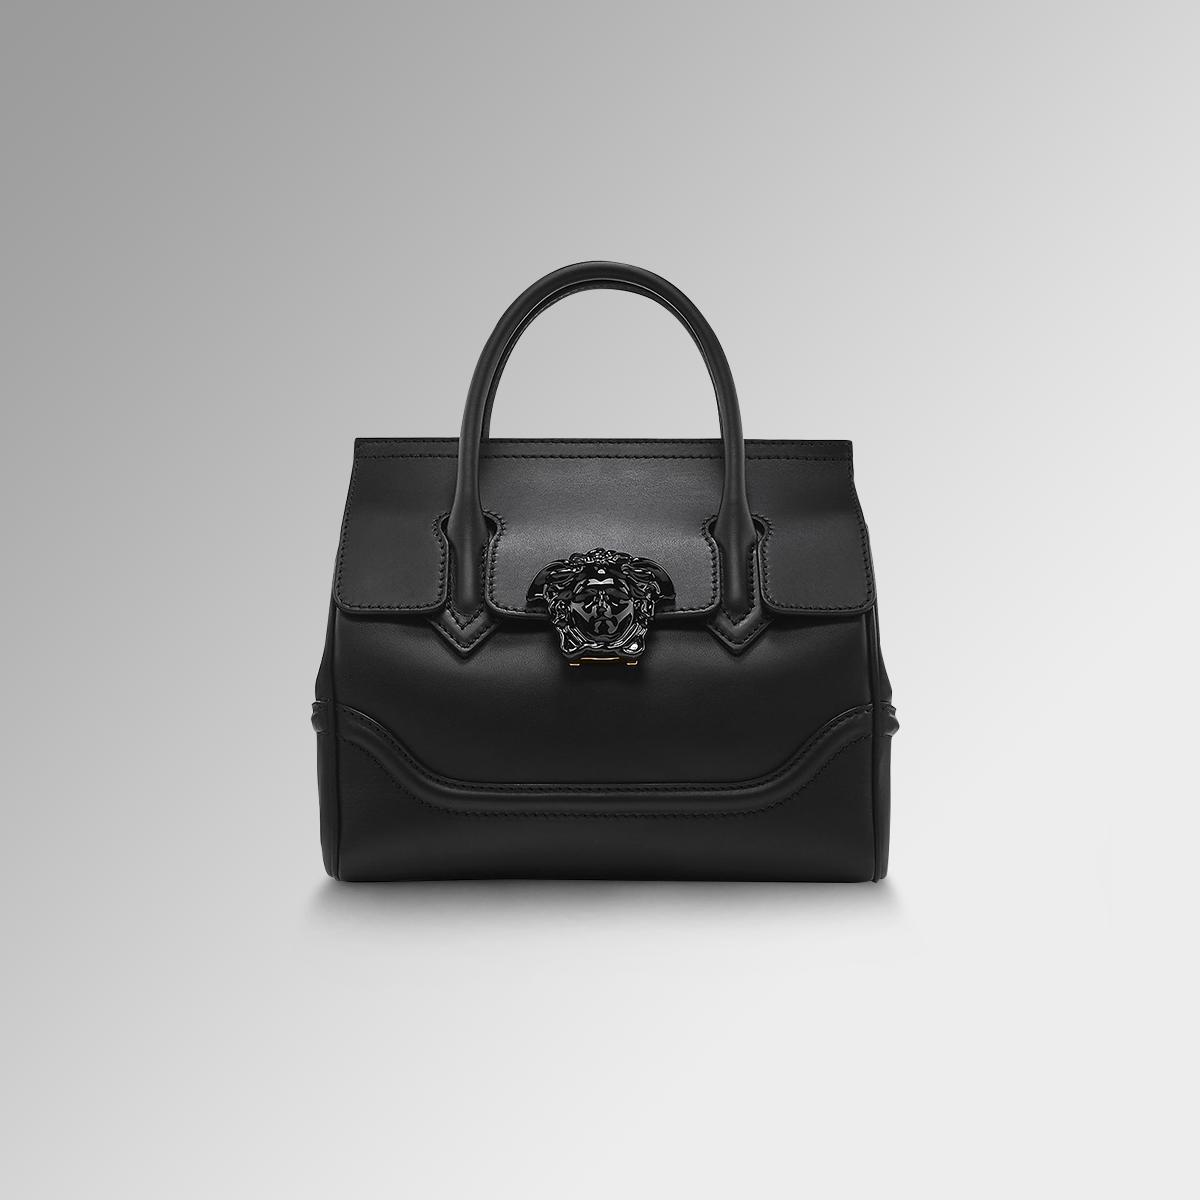 Versace Palazzo Empire bag in black leather.   Versace Palazzo ...